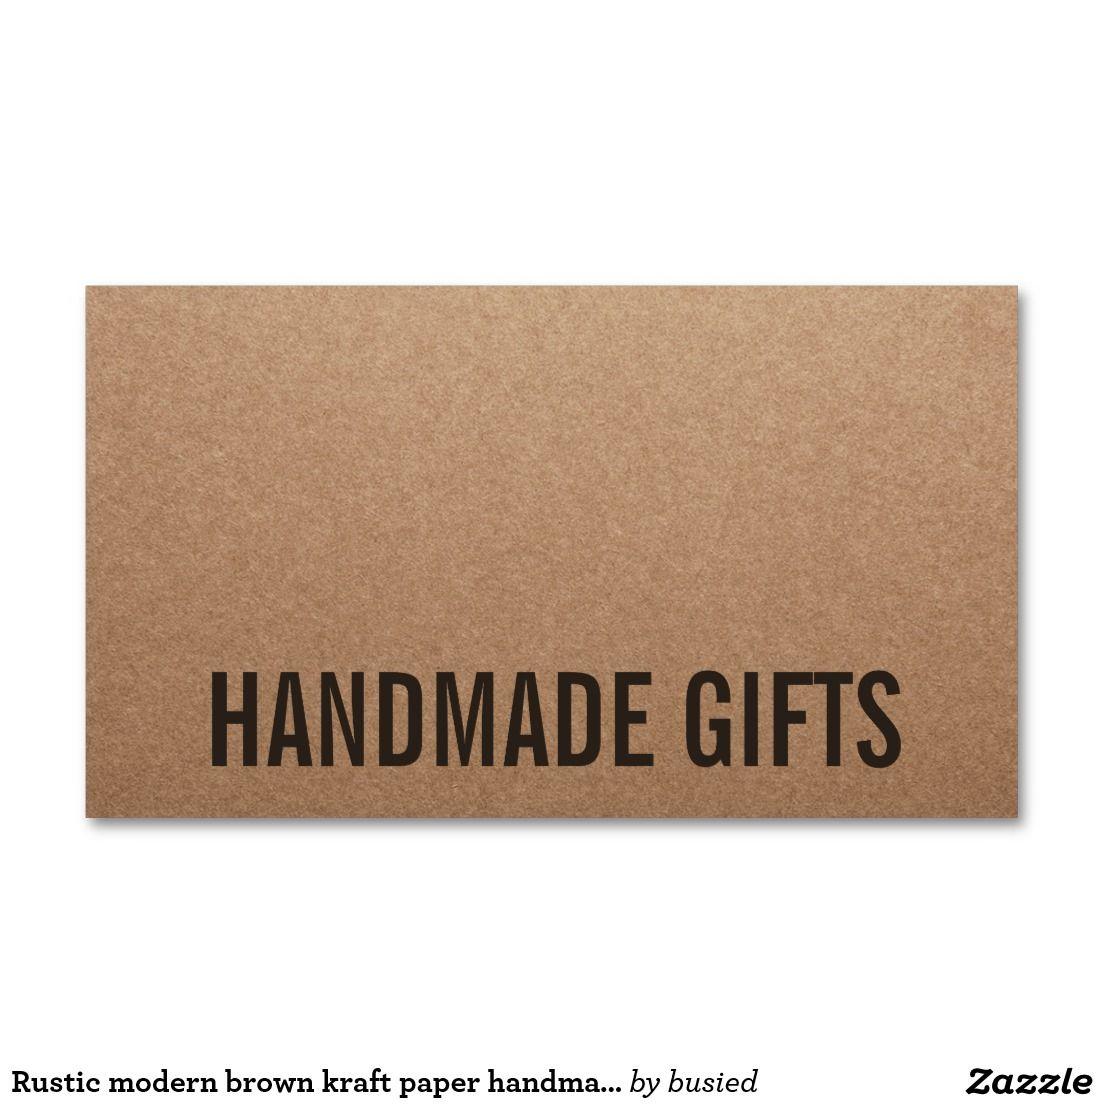 Rustic modern brown kraft paper handmade cardboard double sided rustic modern brown kraft paper handmade cardboard double sided standard business cards pack of colourmoves